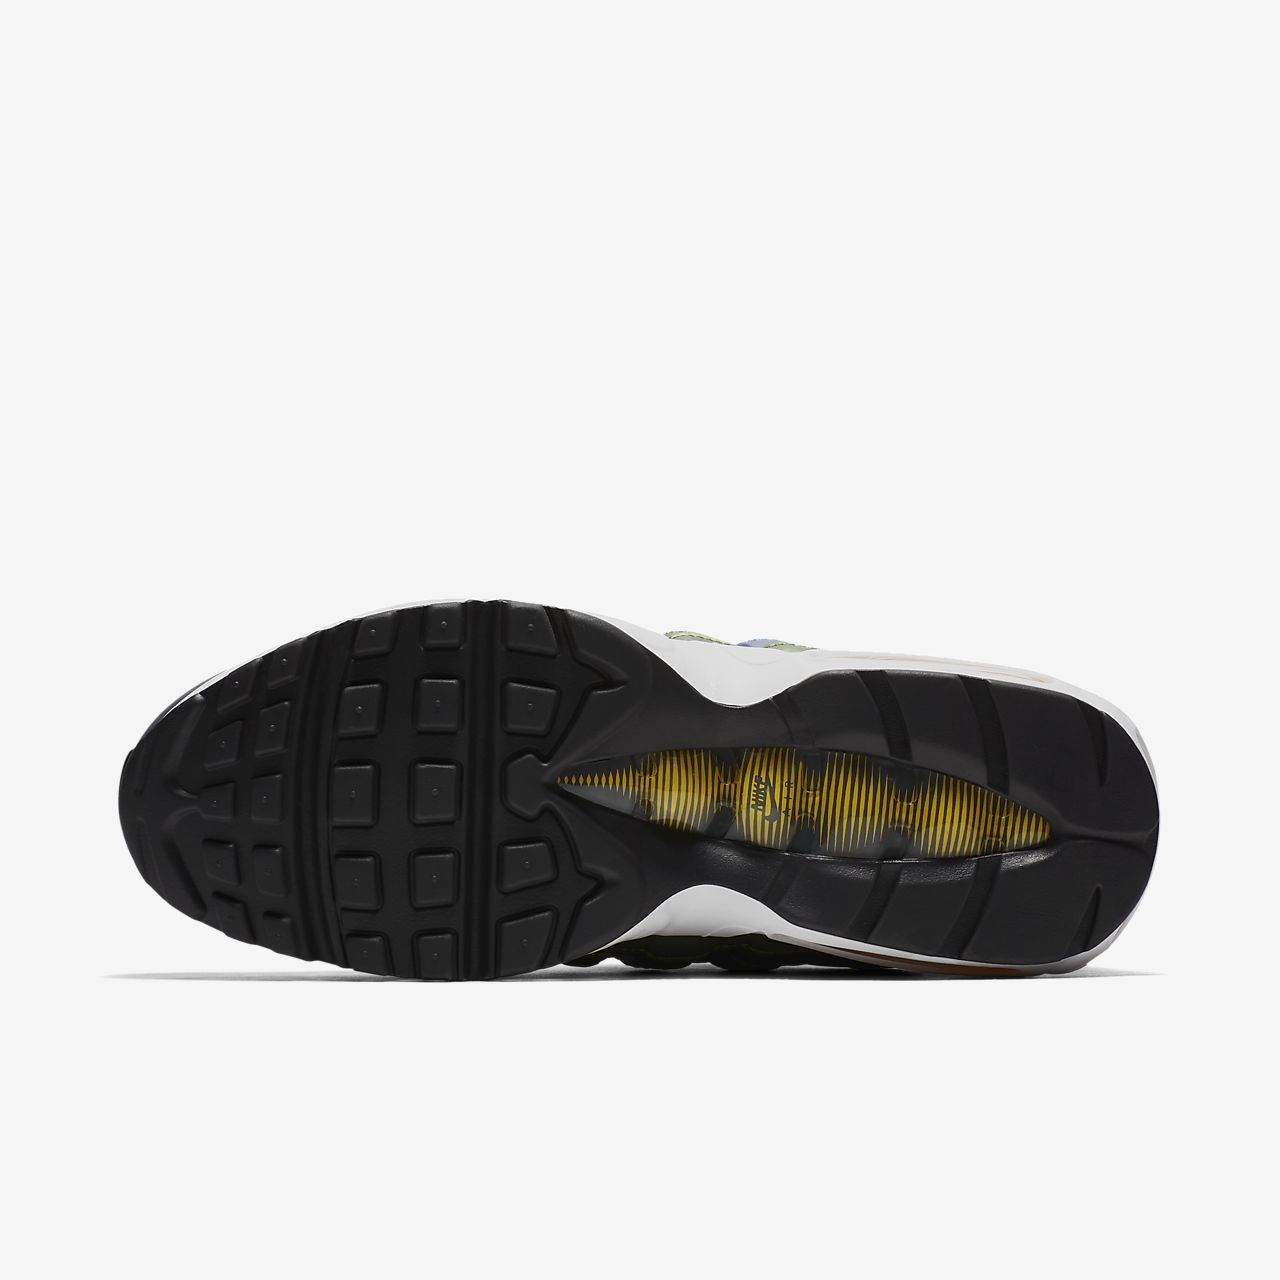 348f1f2857 Nike Air Max 95 Premium Men's Shoe. Nike.com ID